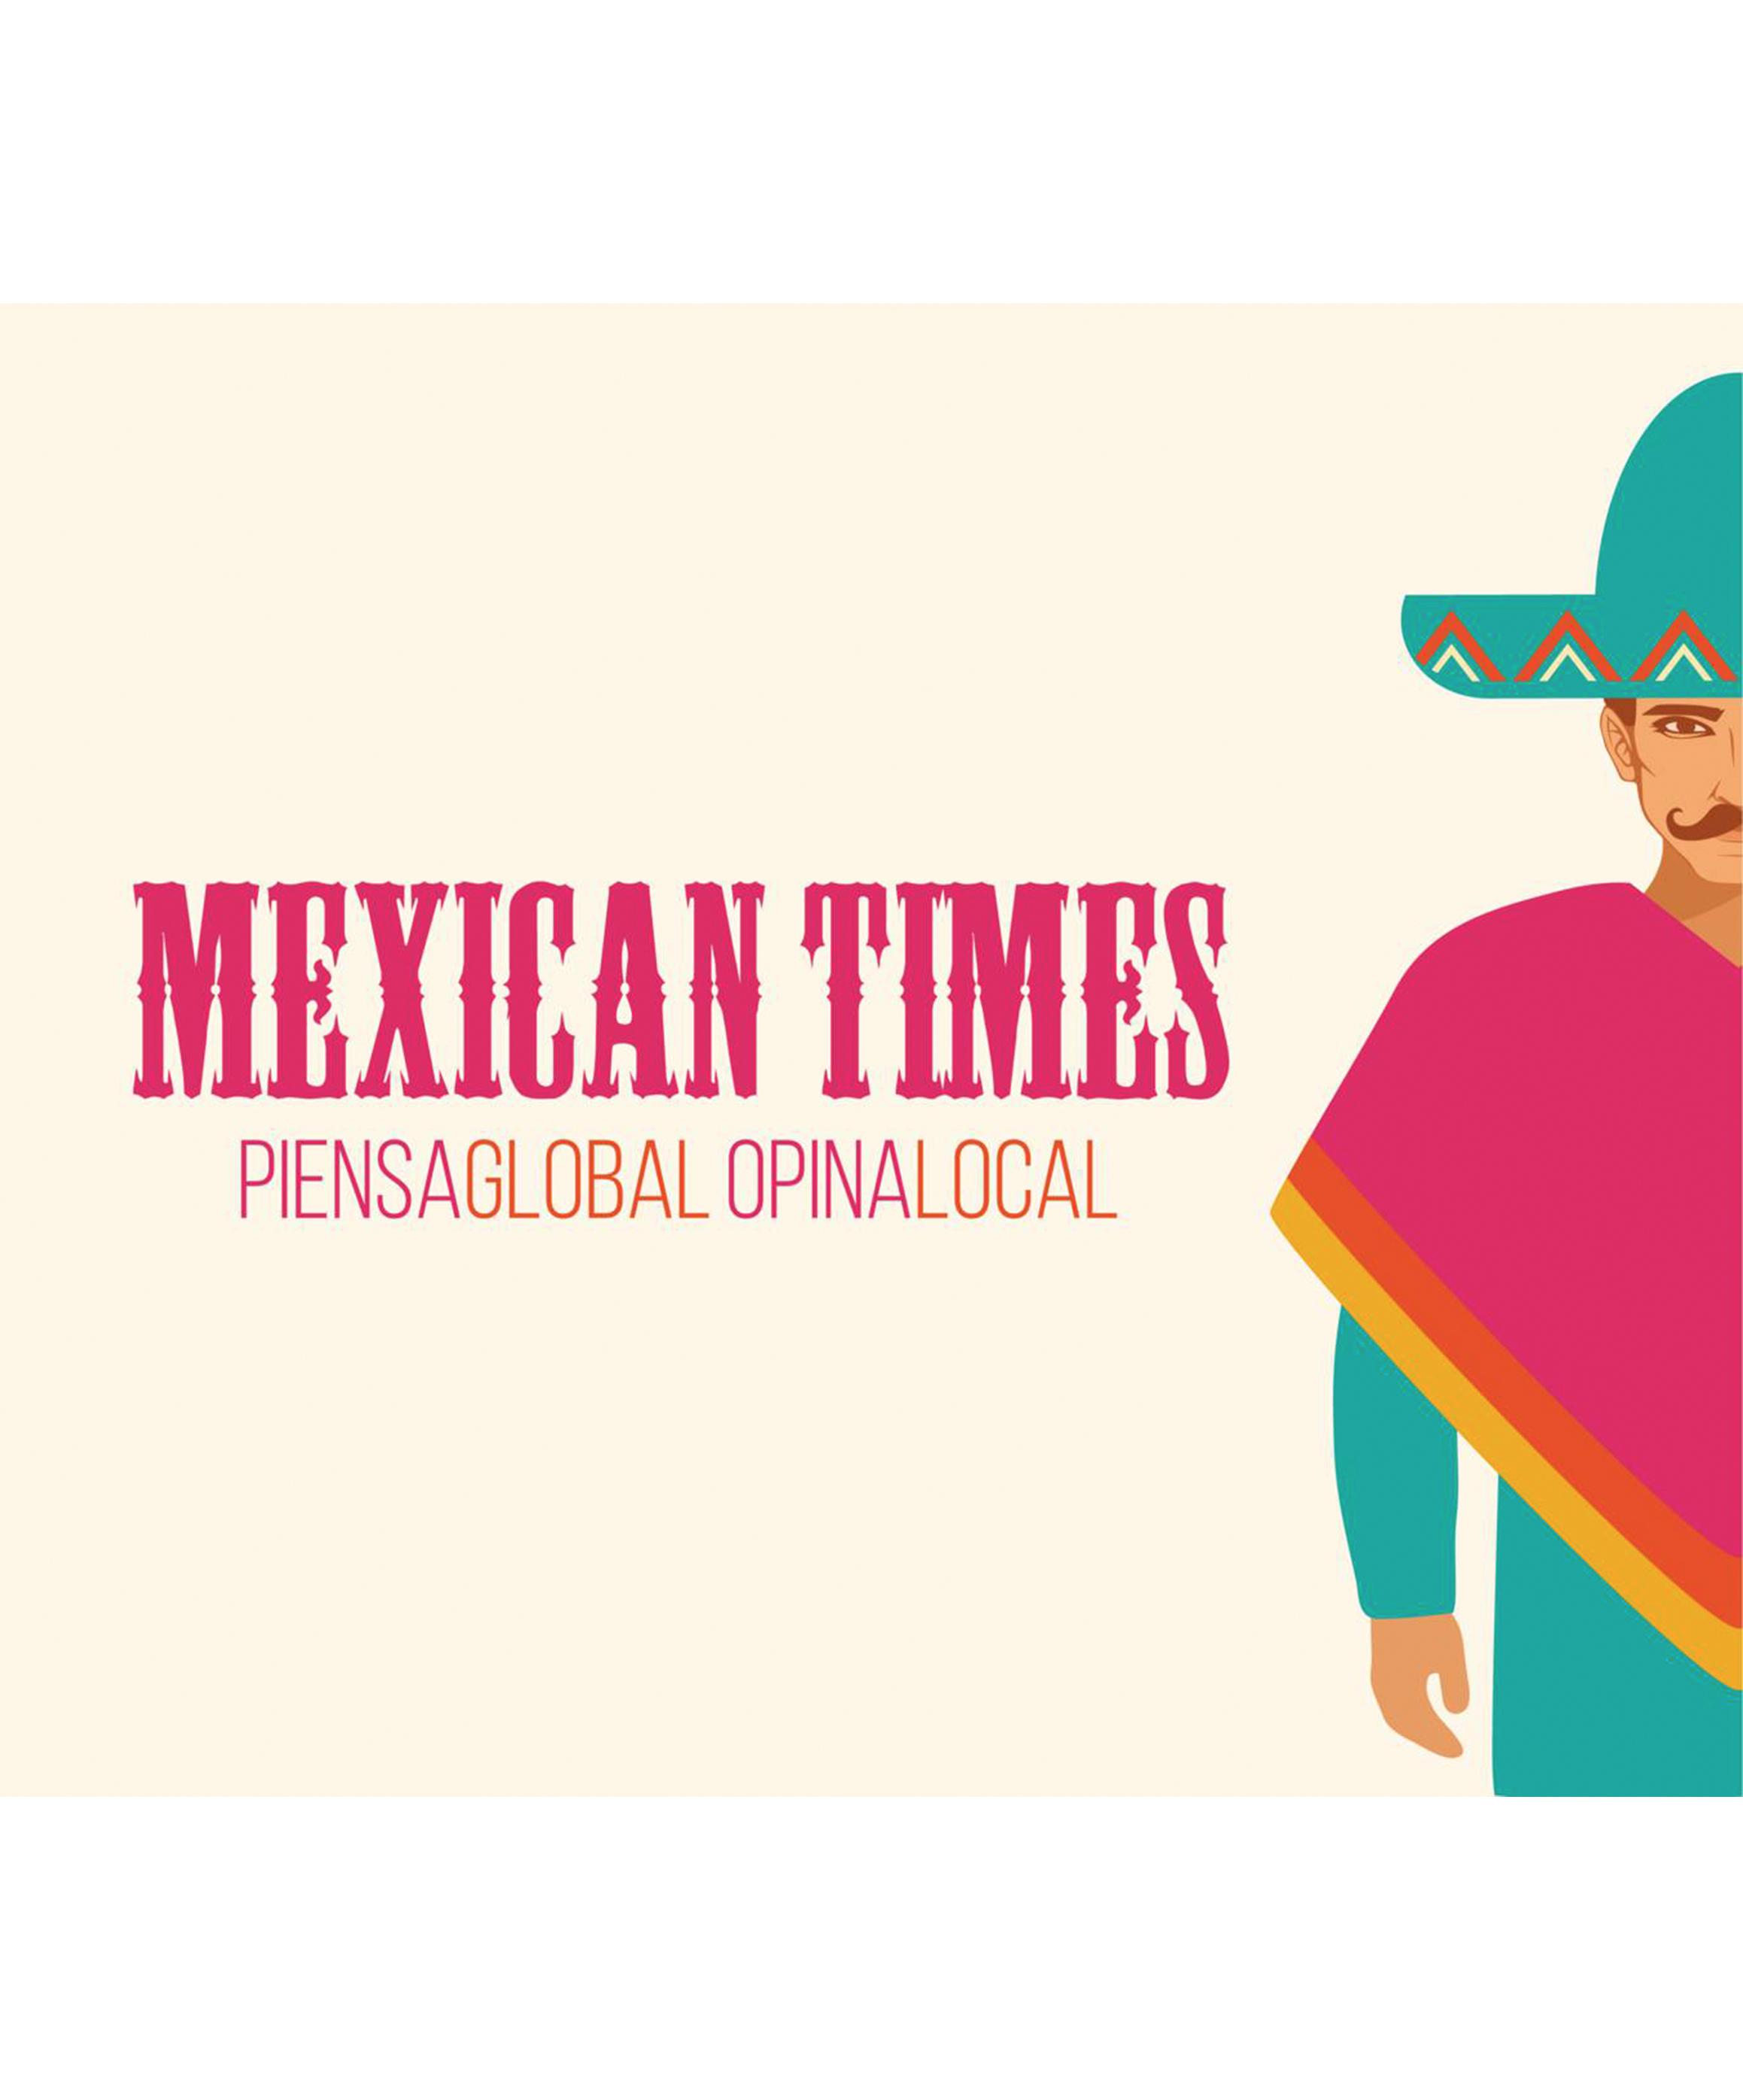 mexicantimes-mexican-times-revista-digital-coqui-vera-arte-abstracto-contemporaneo-mexico